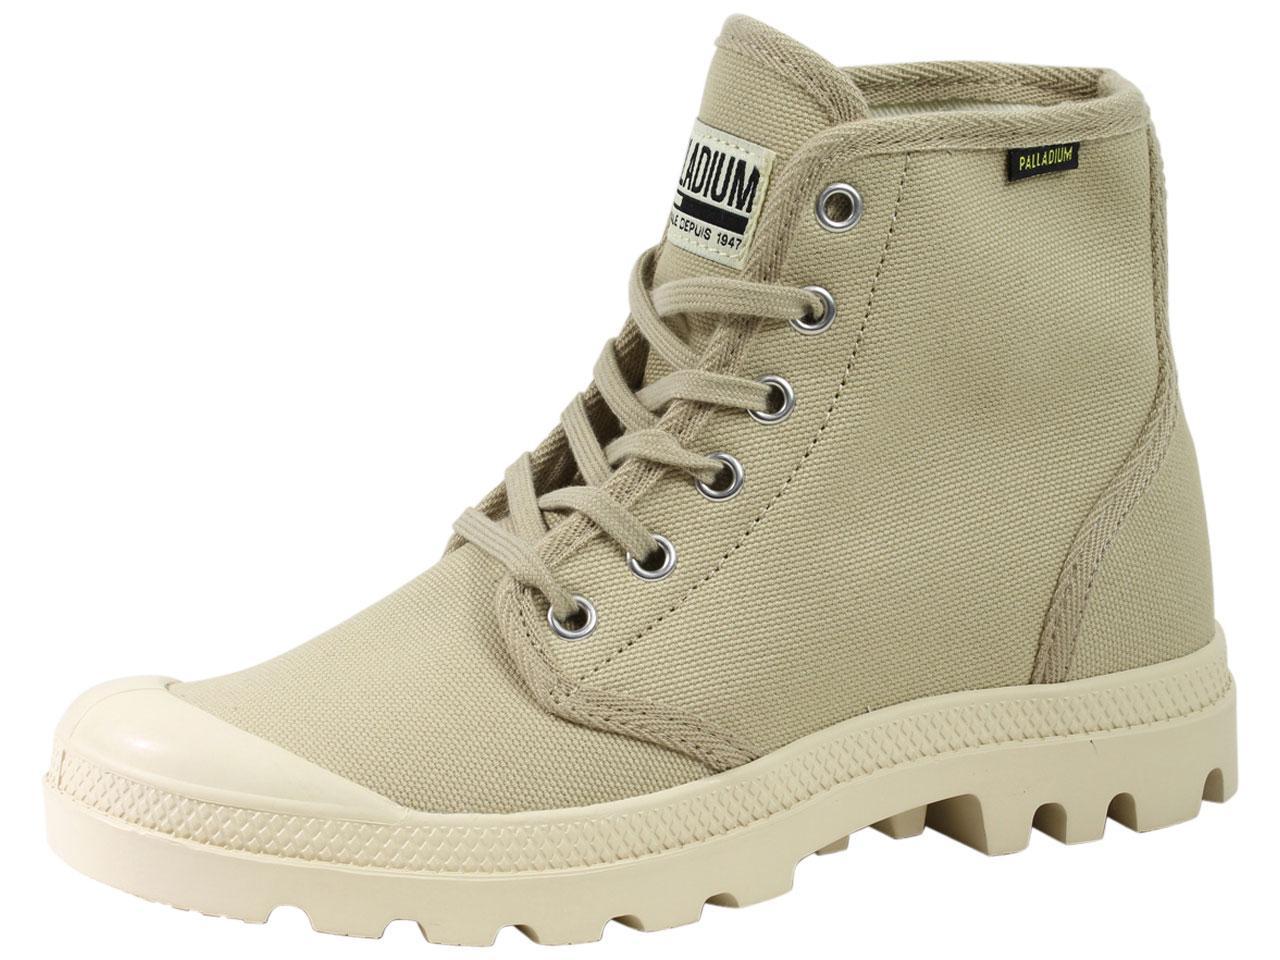 Image of Palladium Men's Pampa Hi Originale Chukka Boots Shoes - Beige - 7 D(M) US/8.5 B(M) US